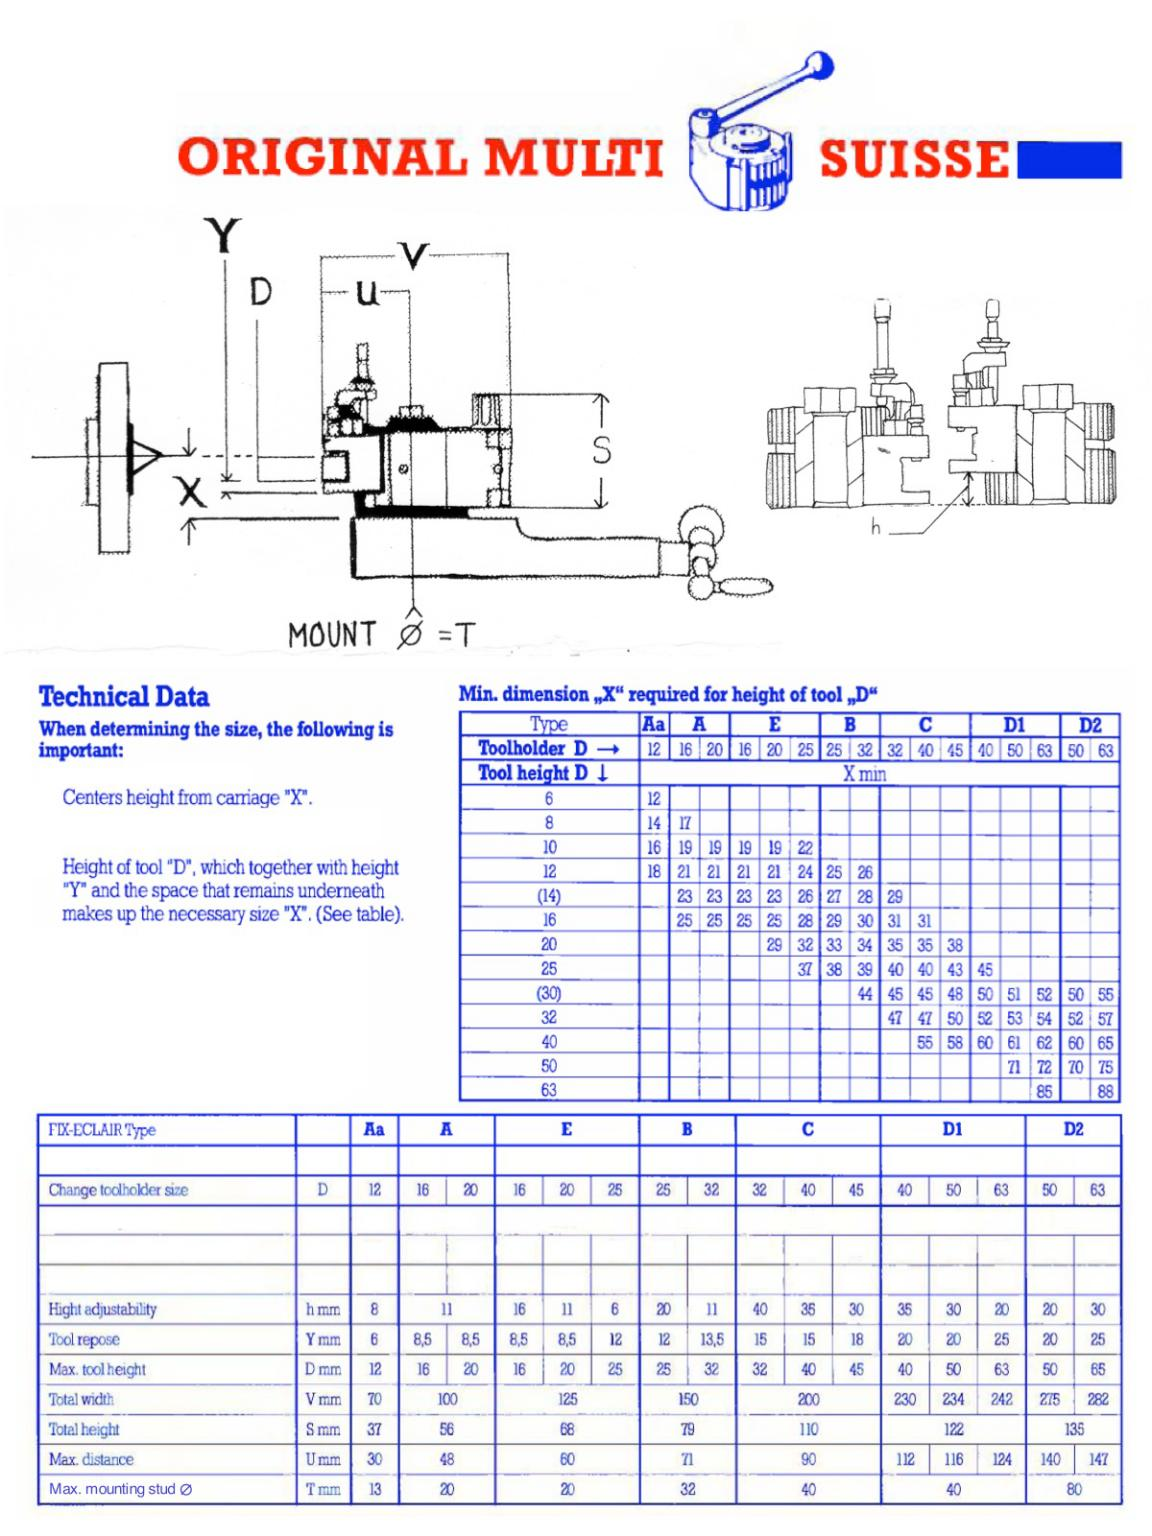 Porte outils multifix (Amestra) Uw1111